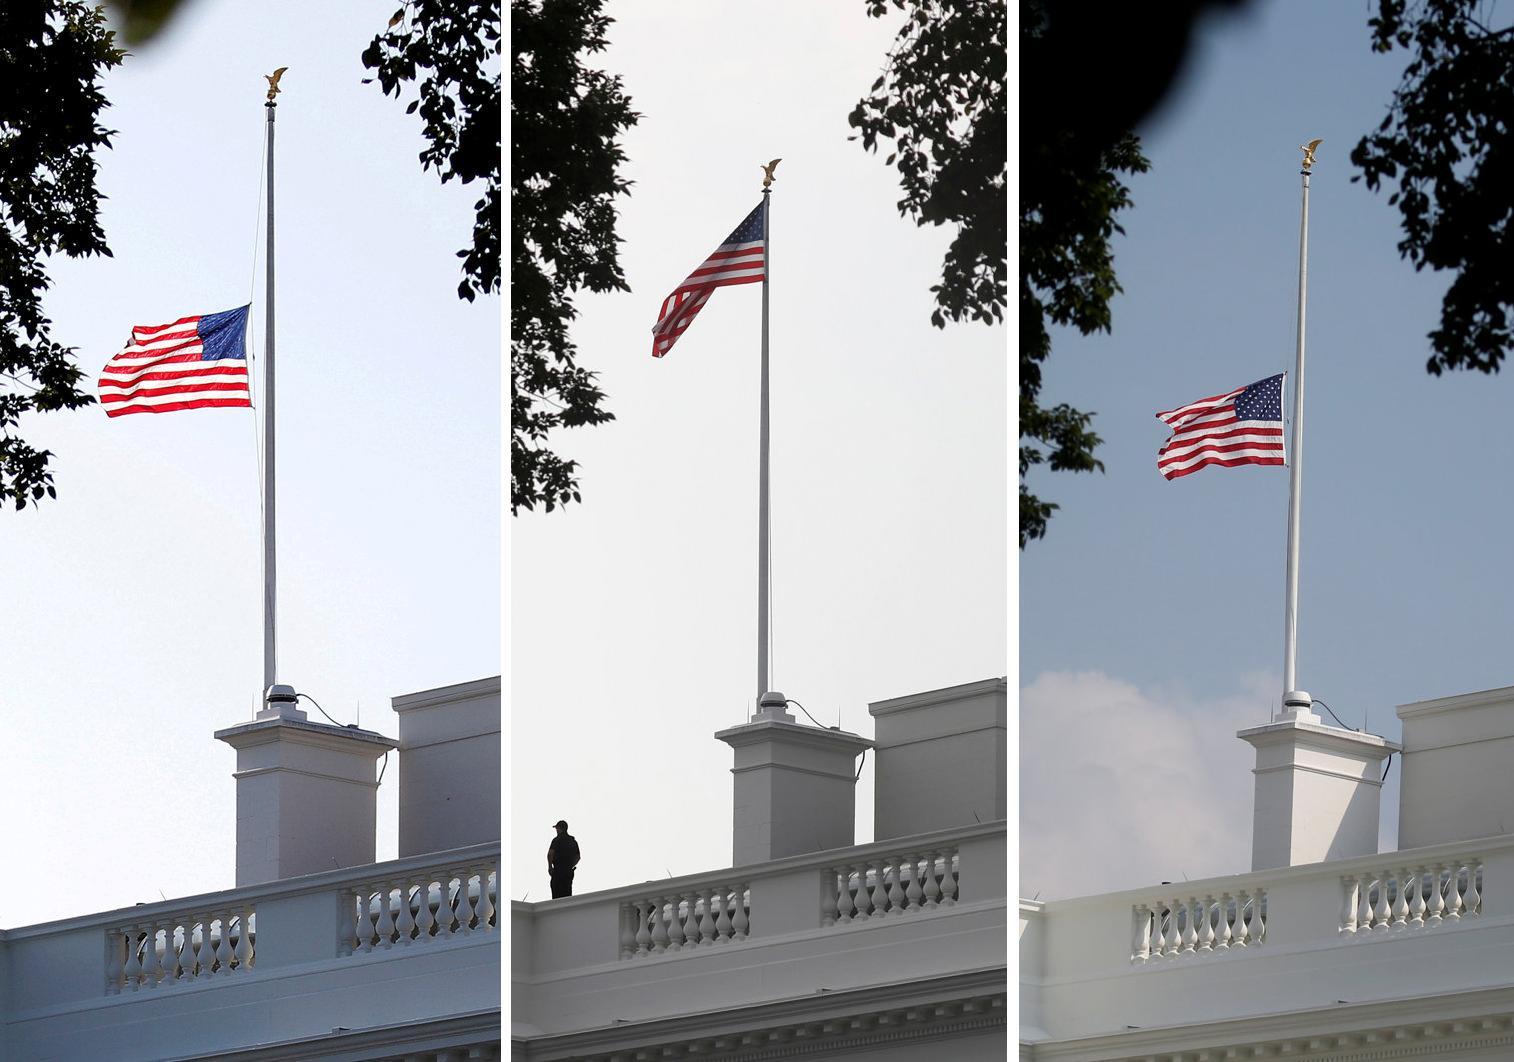 Stupendous White House Wobbles On U S Flag After Mccain Death Reuters Download Free Architecture Designs Scobabritishbridgeorg